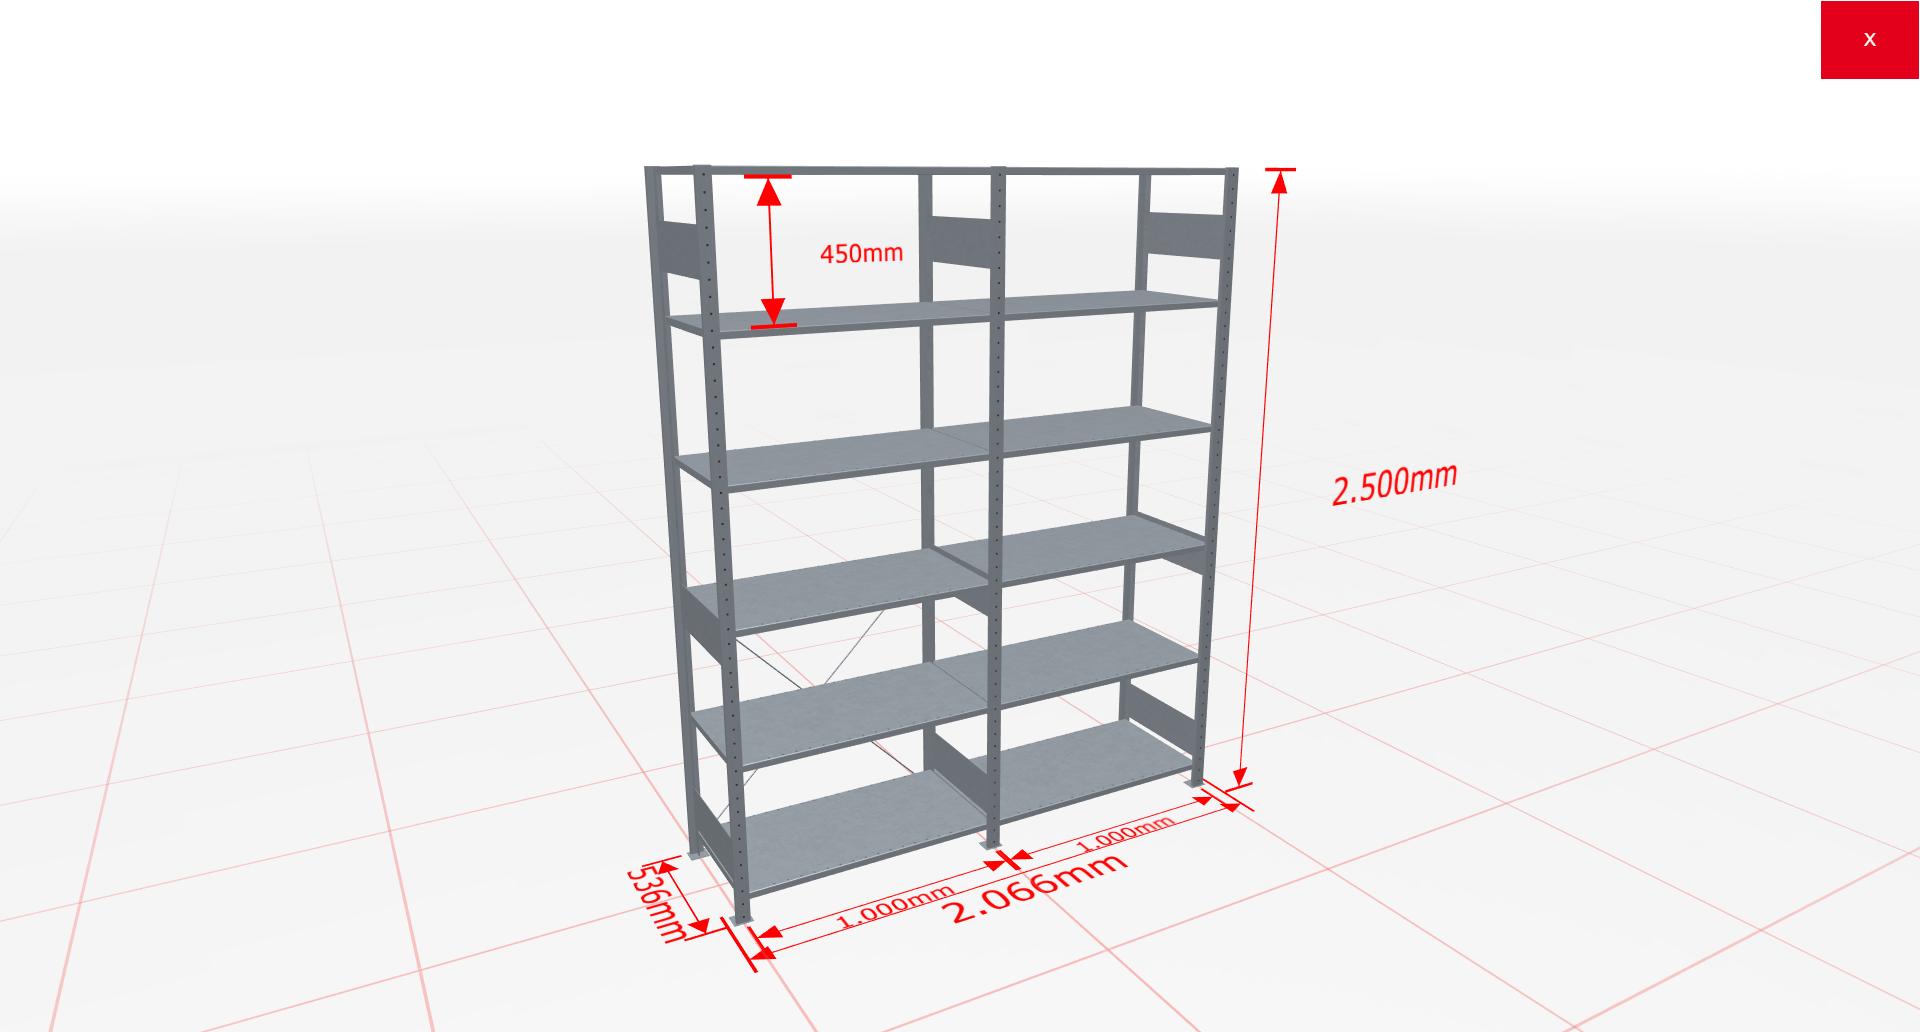 Fachbodenregal Komplettregal 2500x2066x500 mm (HxBxT) SCHULTE Lagertechnik verzinkt 6 Ebenen  150 kg je Boden